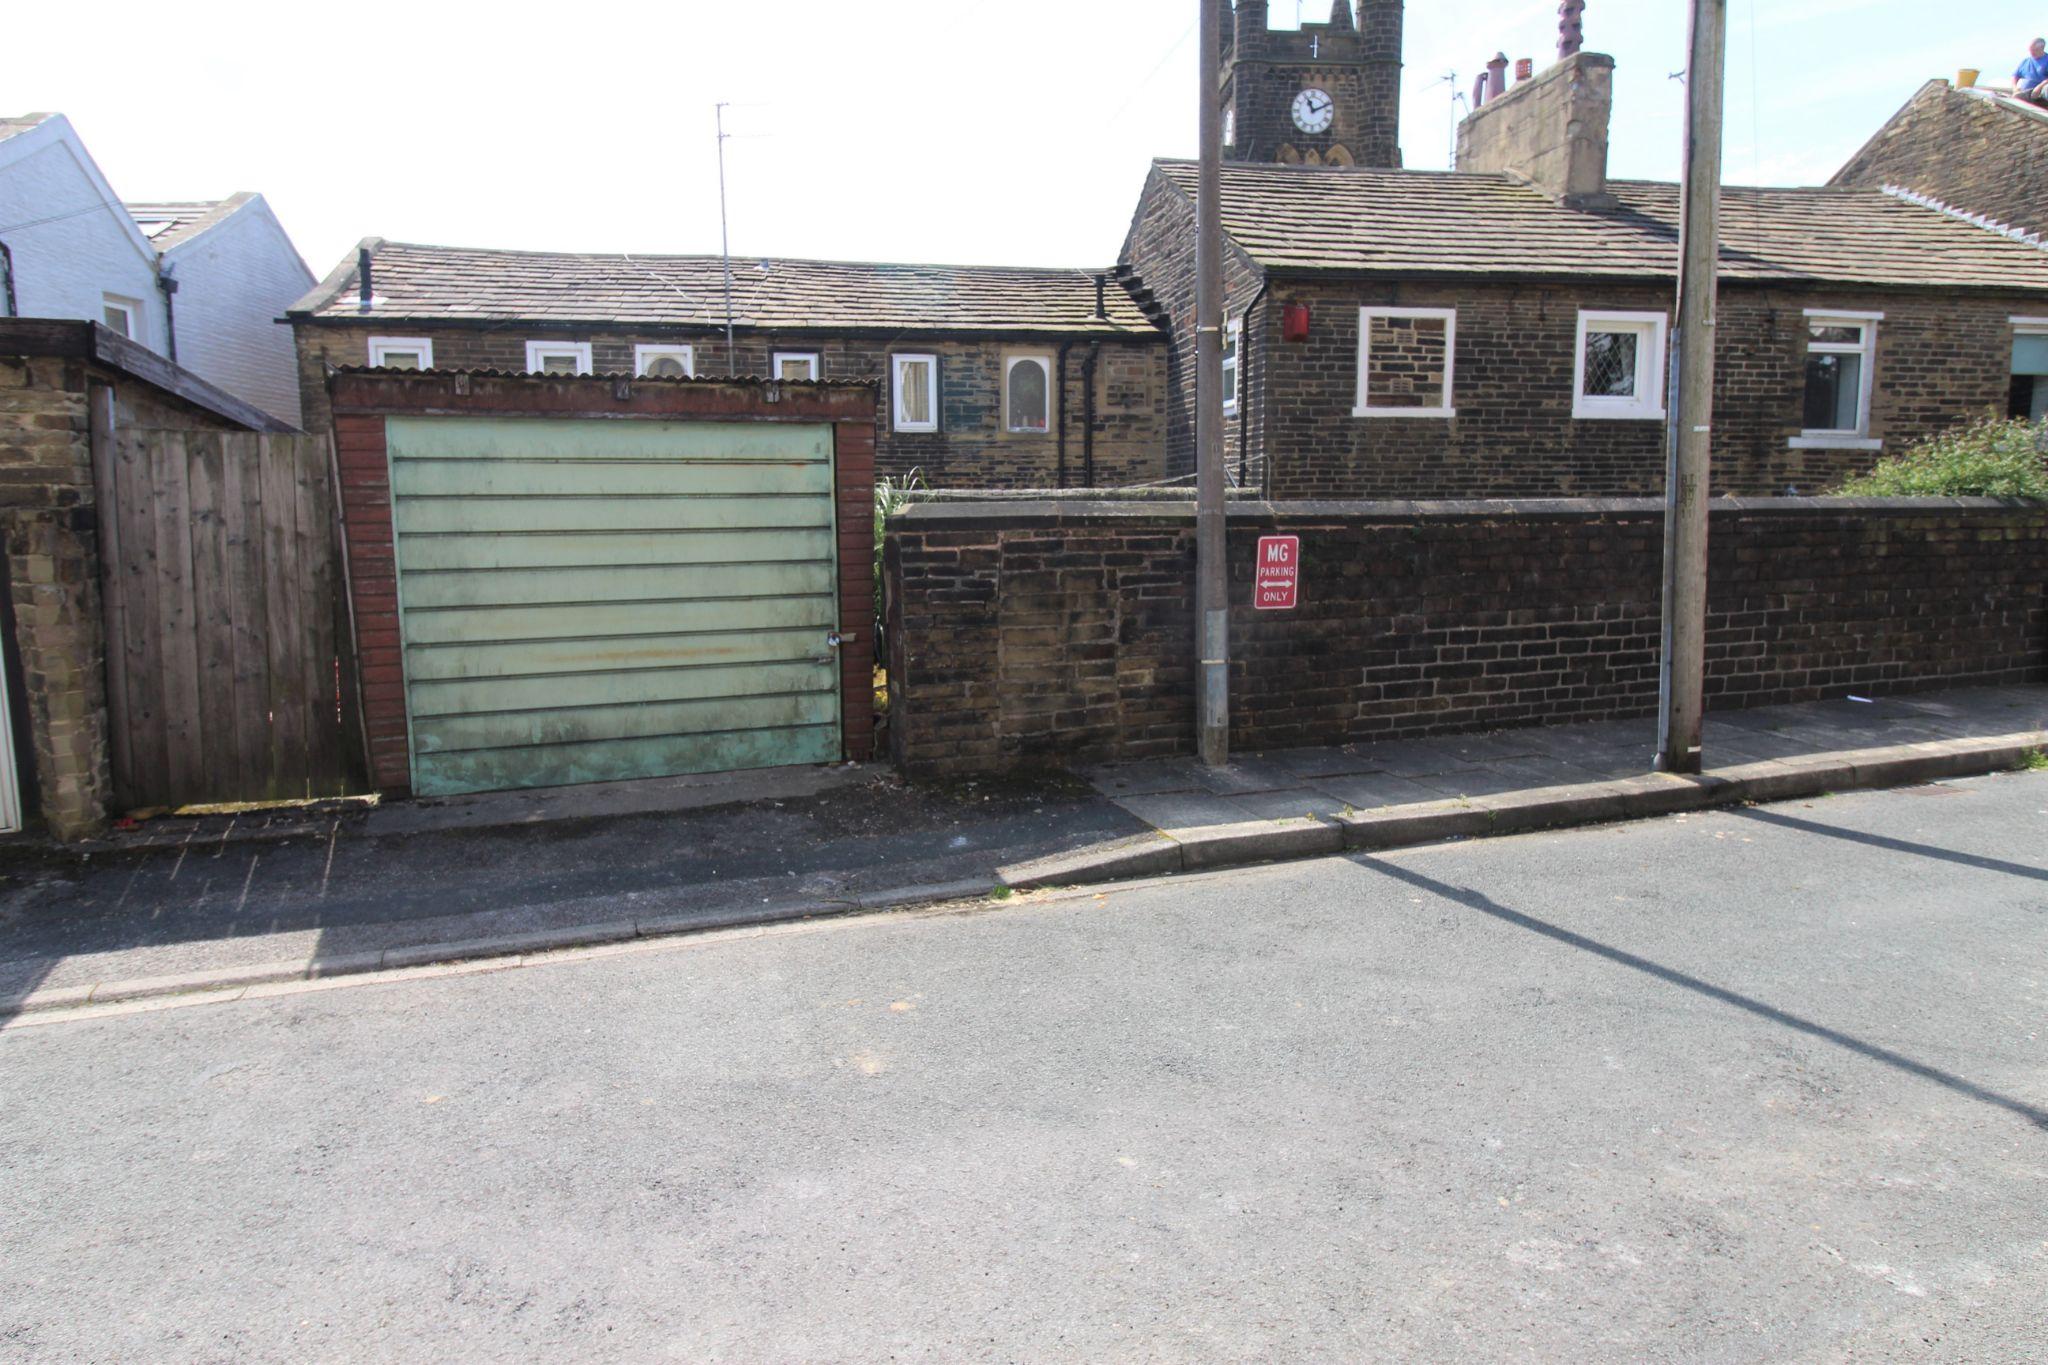 3 bedroom mid terraced house SSTC in Bradford - Garage